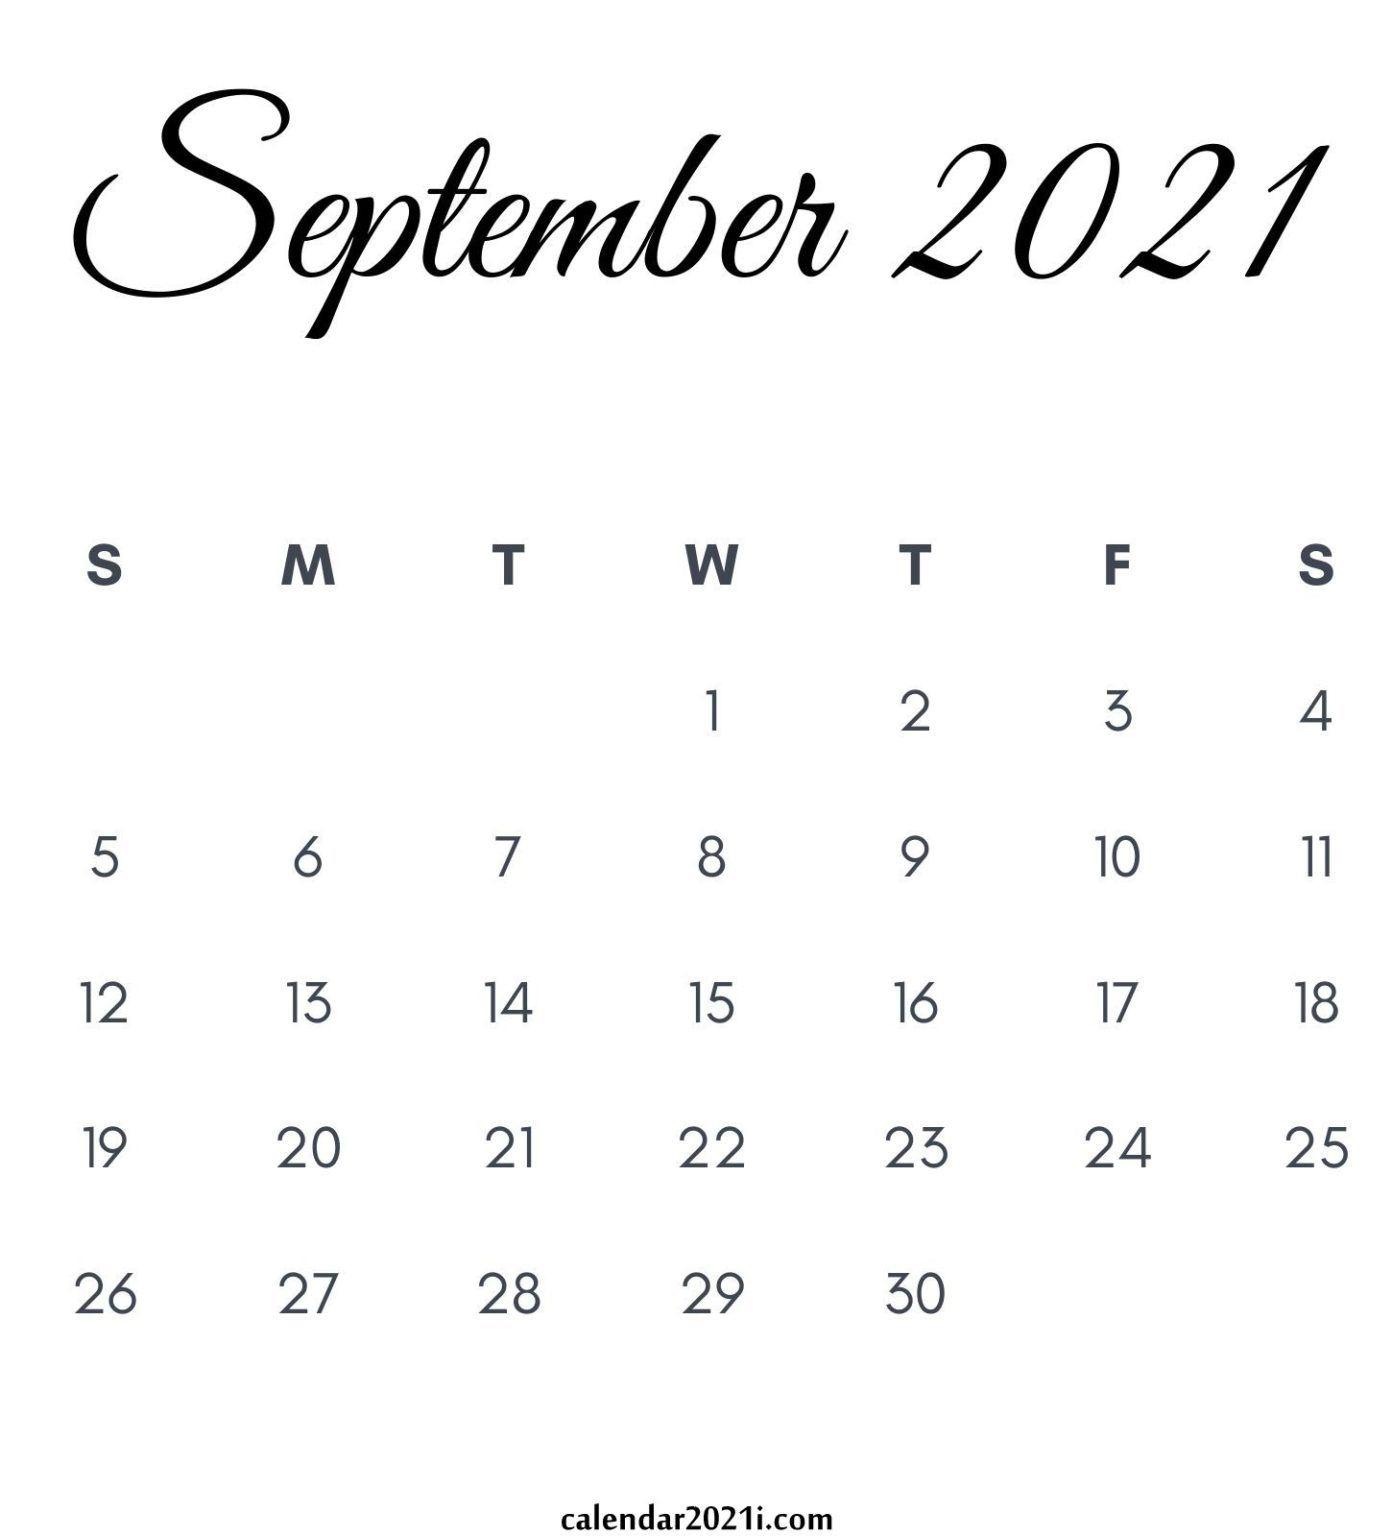 September 2021 Calendar Printable In 2020 | Printable throughout September 2021 Calendar Printable